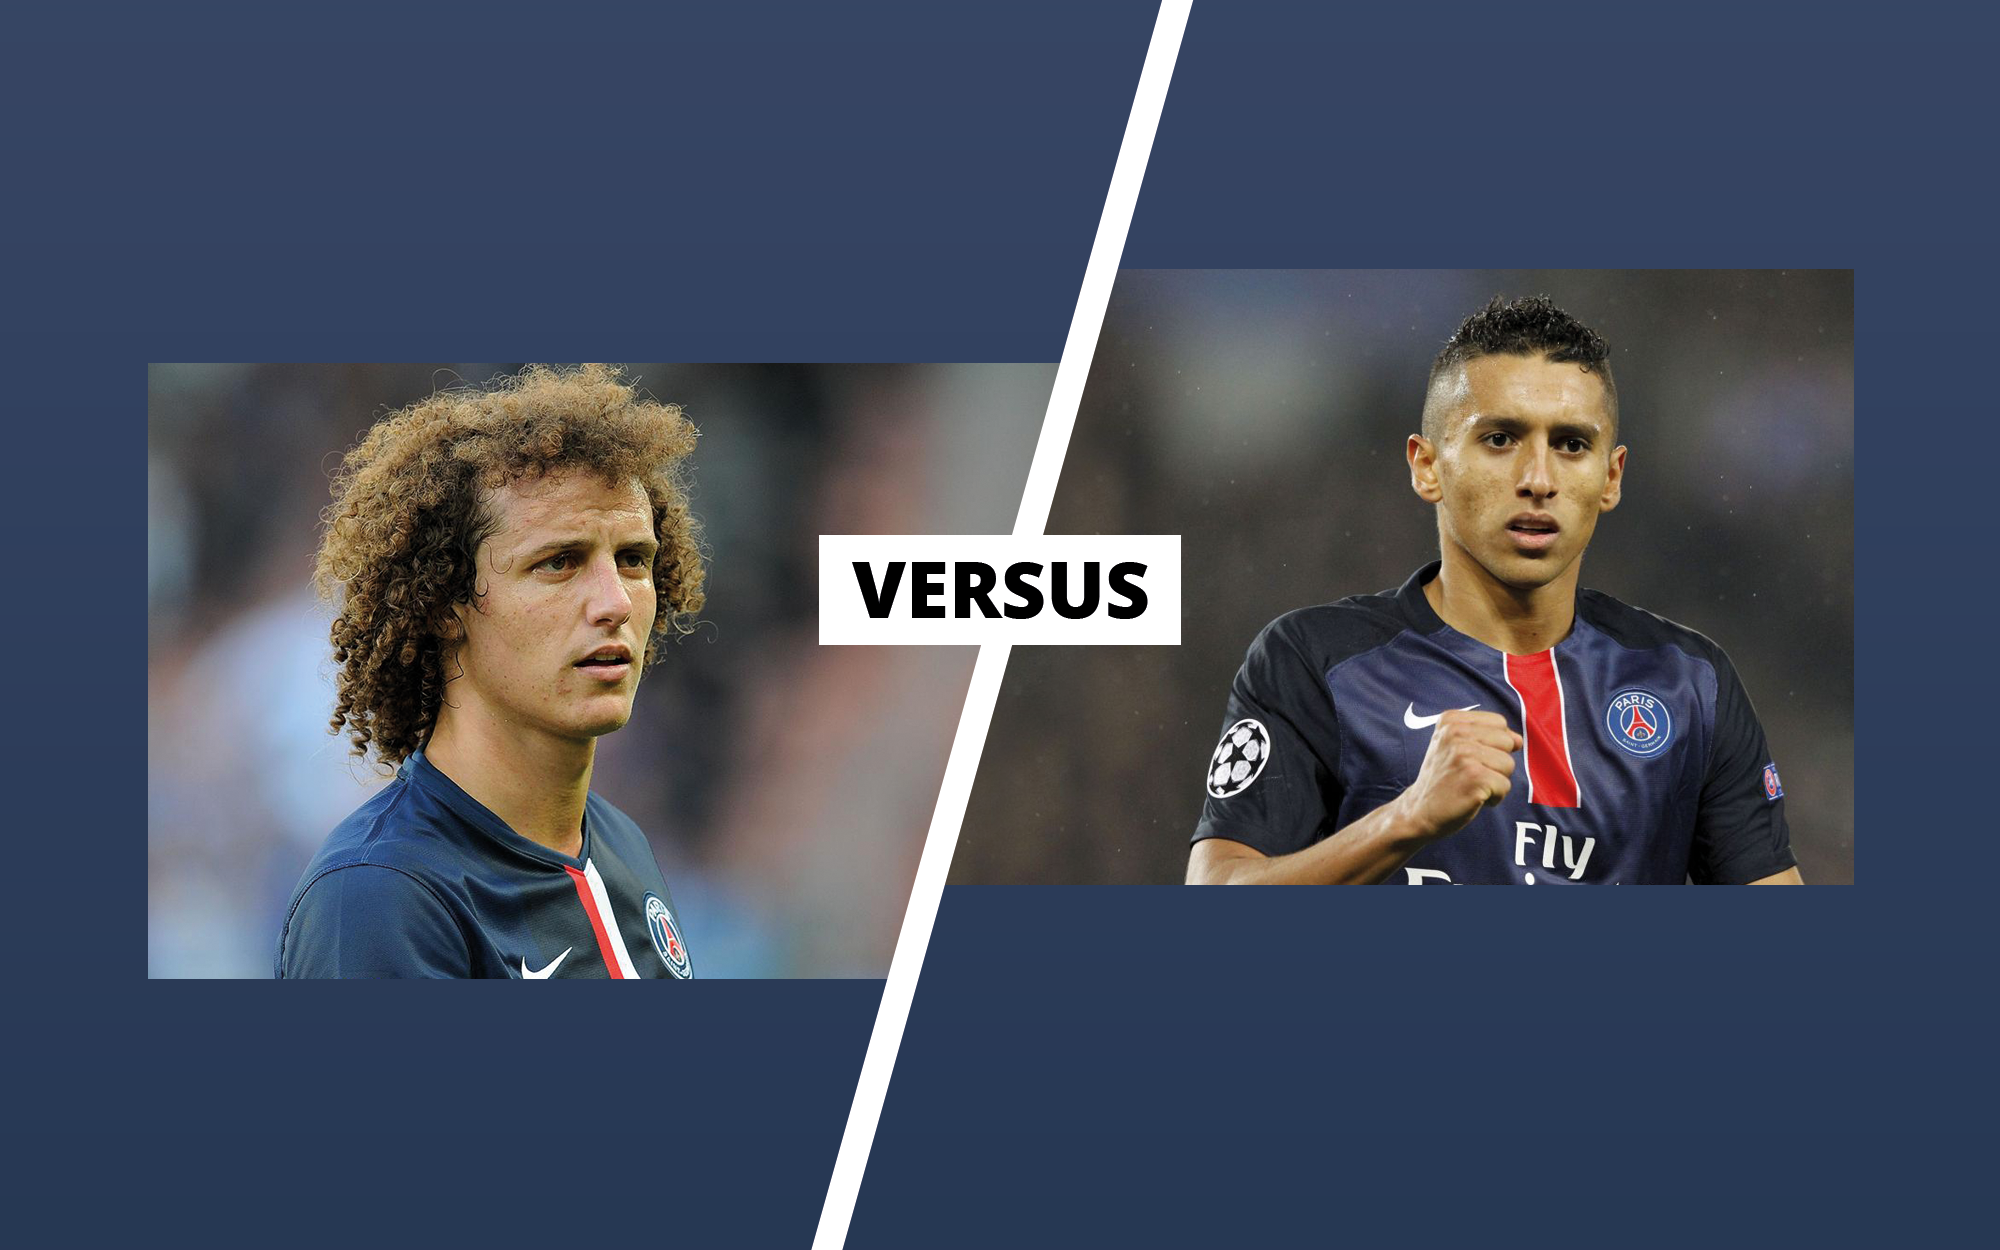 Battle #1 – David Luiz vs Marquinhos